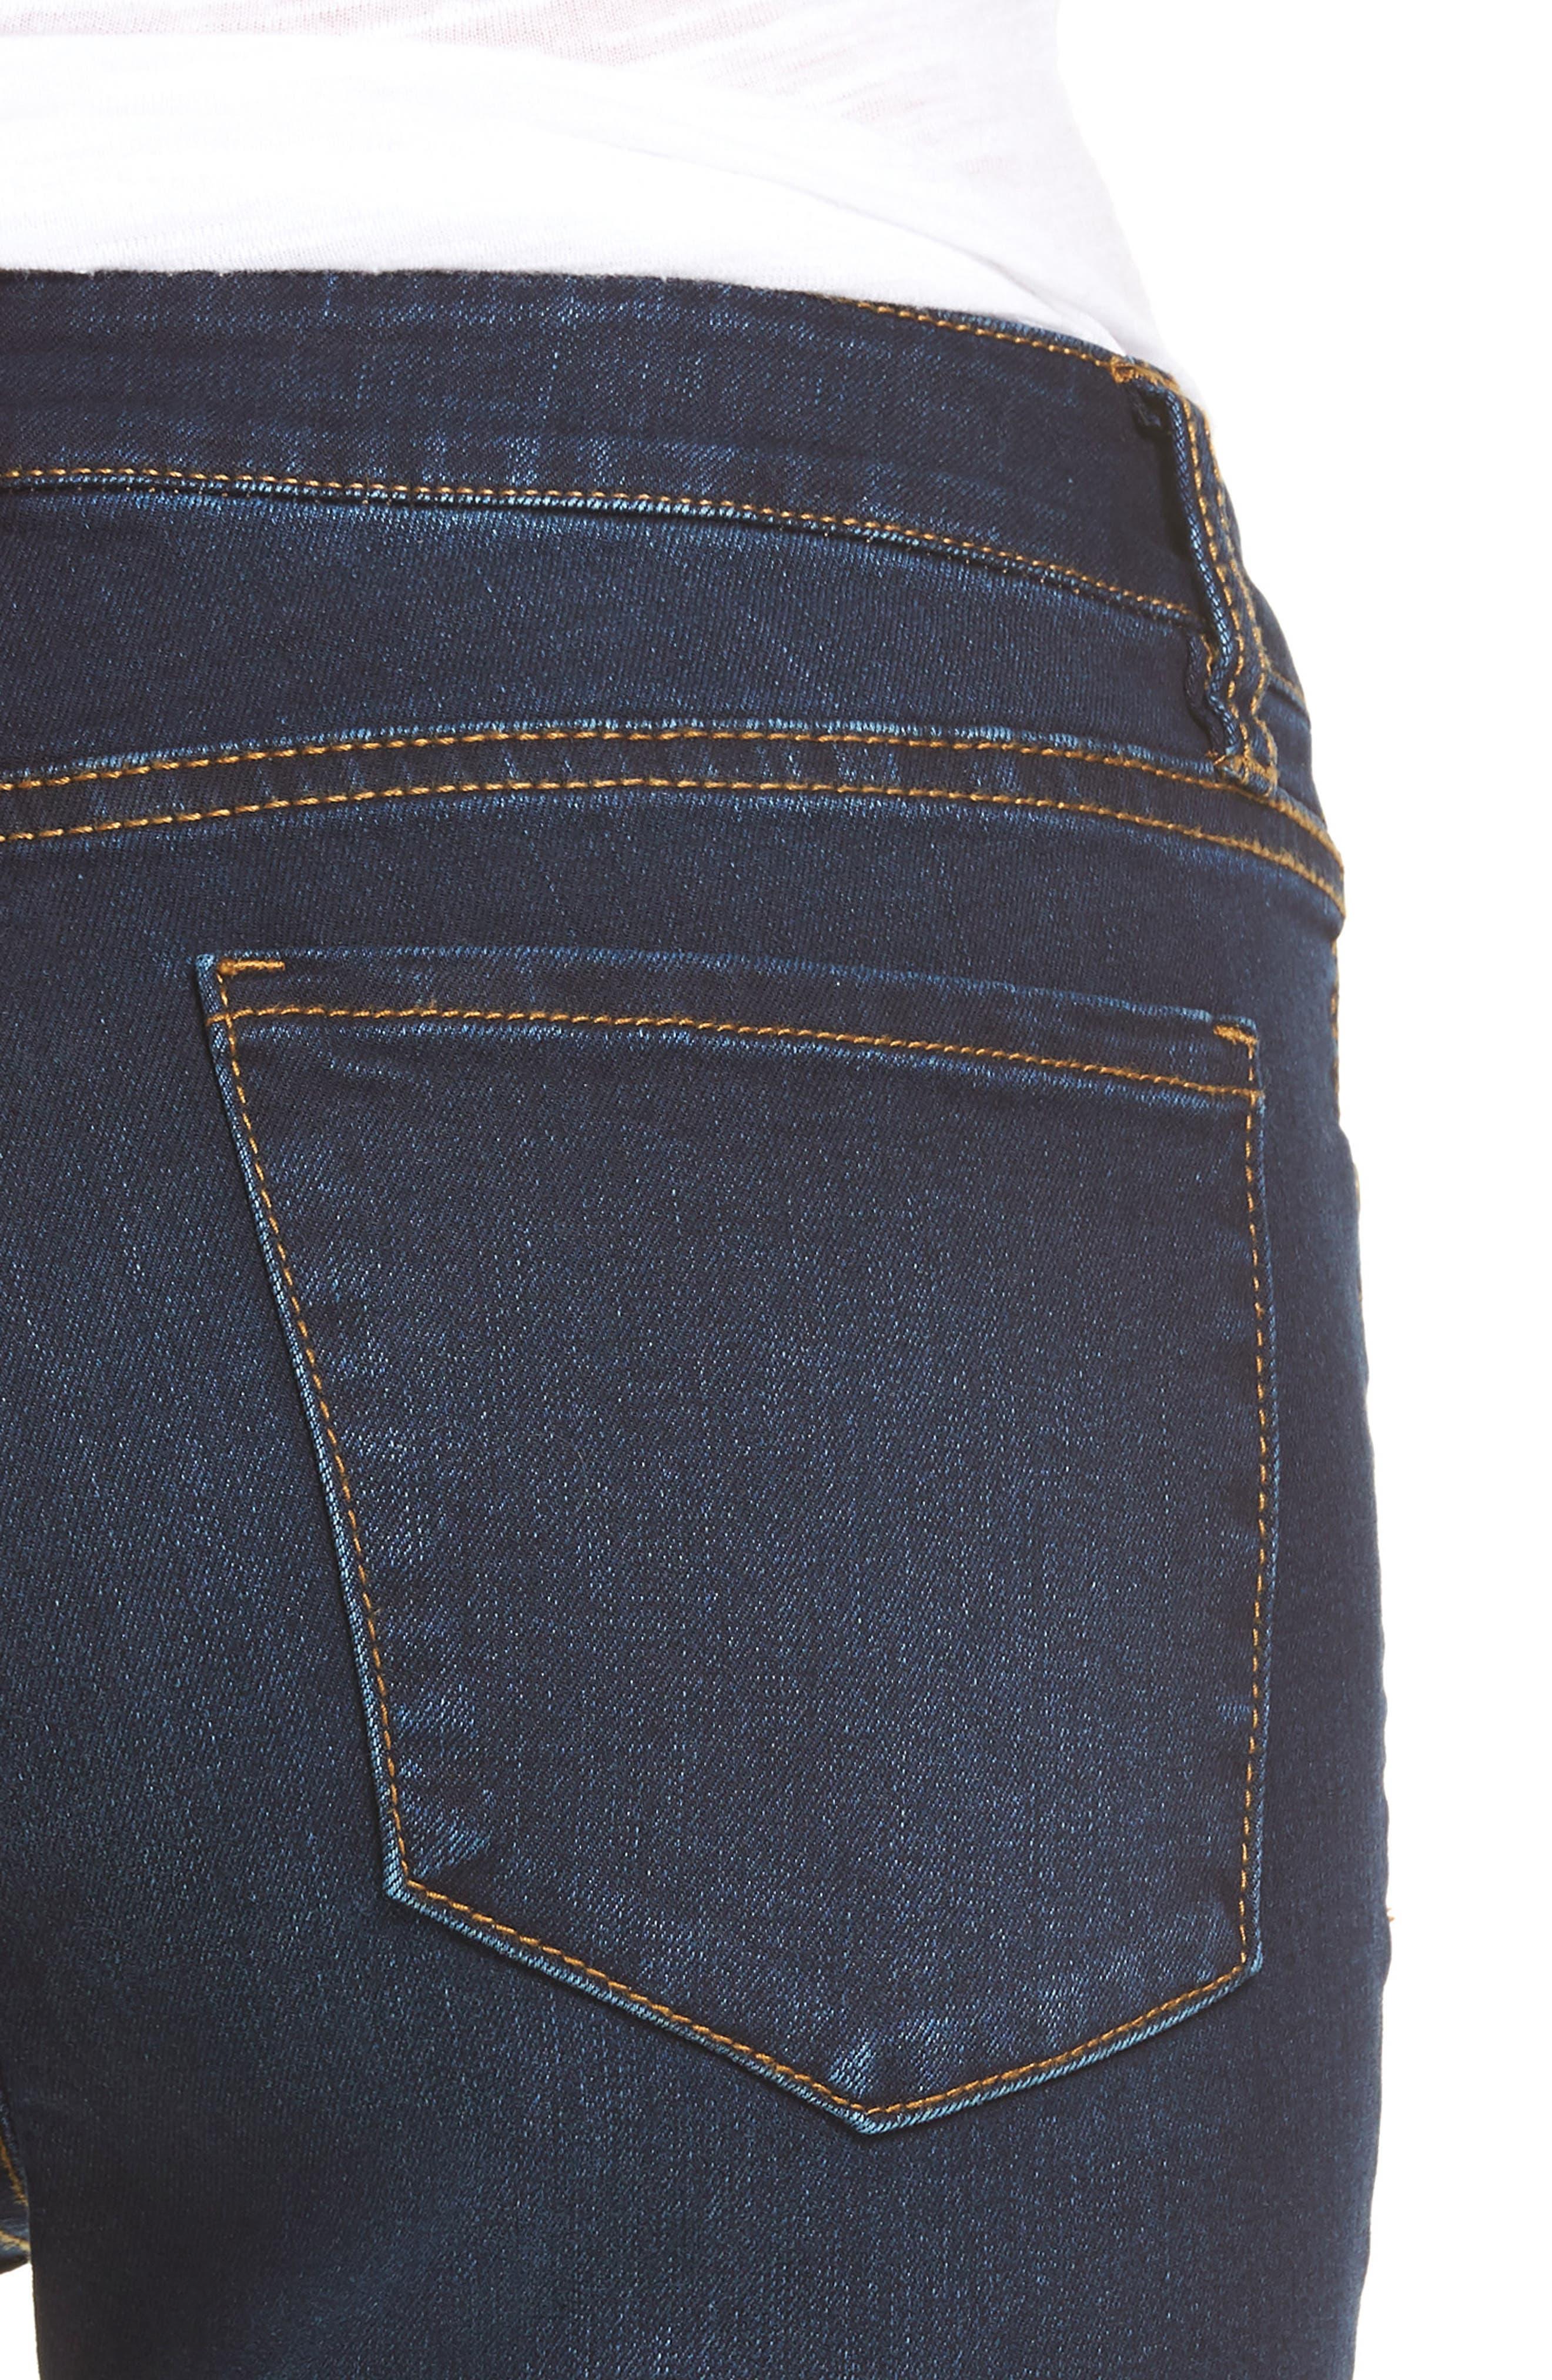 Ankle Skinny Jeans,                             Alternate thumbnail 4, color,                             Dark Wash